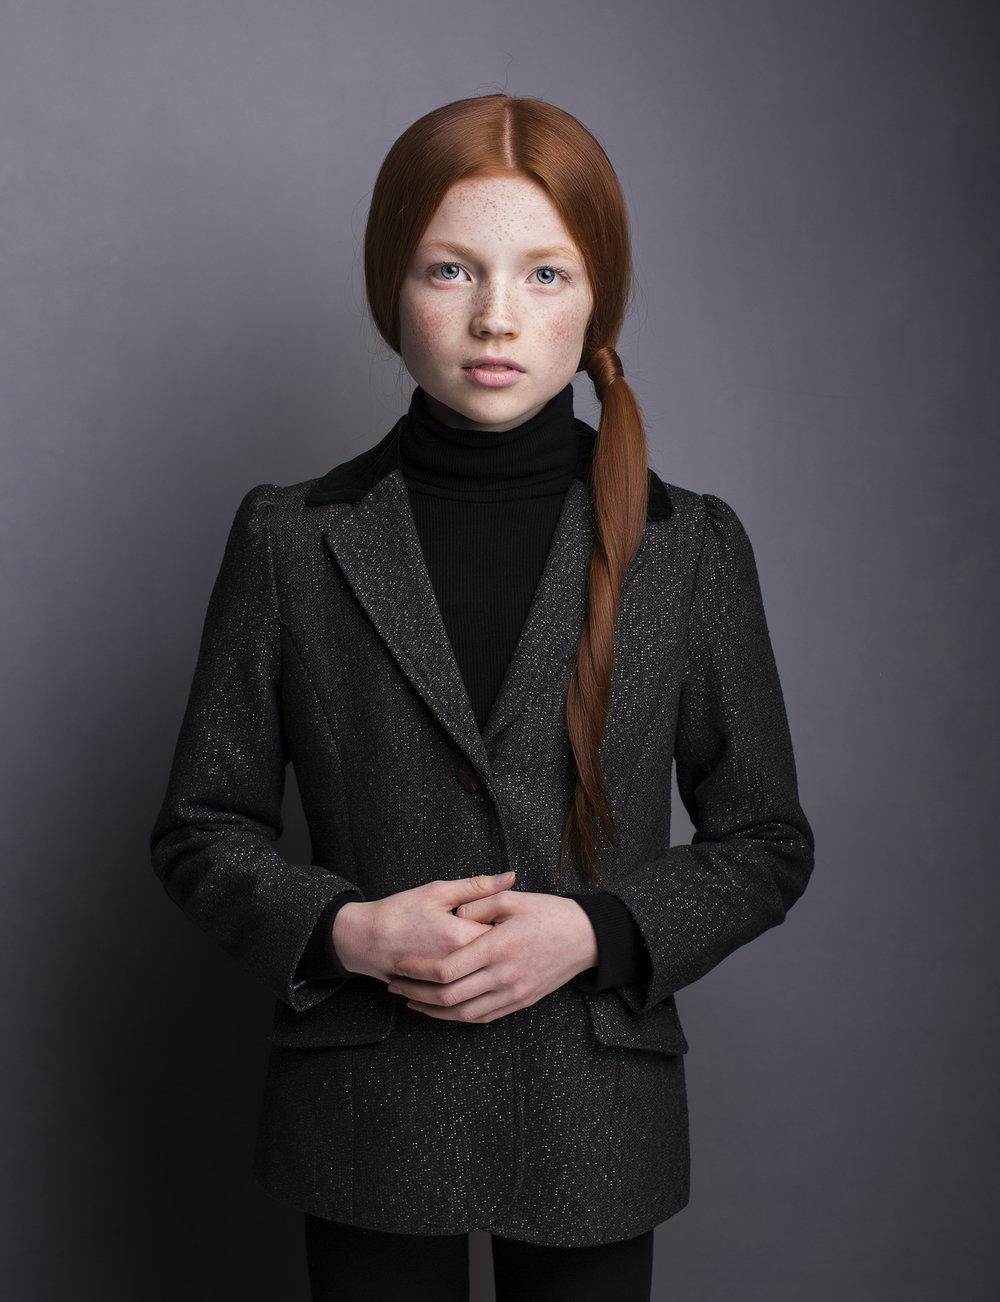 Elizabethg_fineart_portrait_photography_esme_kidslondon_model_agency_004.jpg